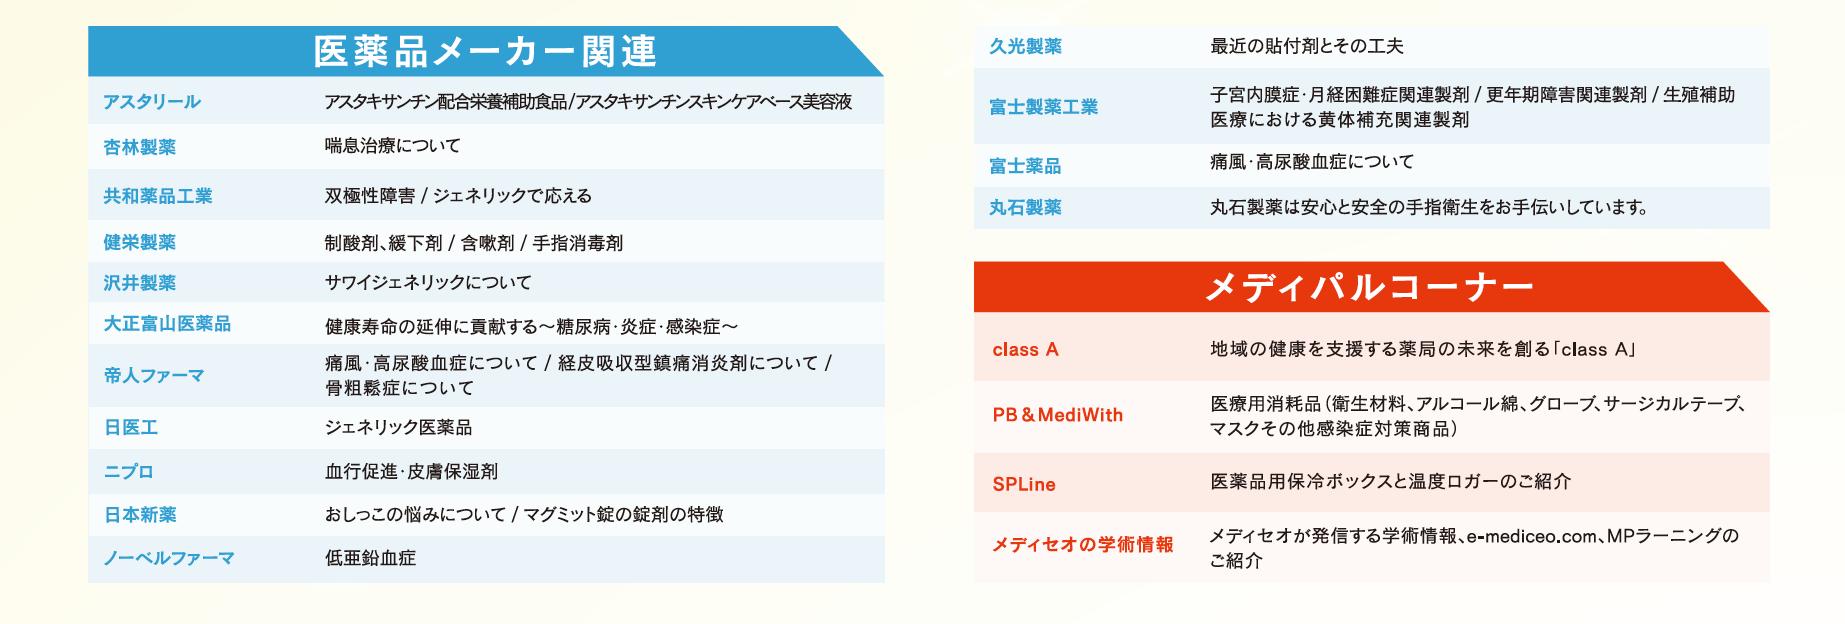 tokyo18_gb_08_02